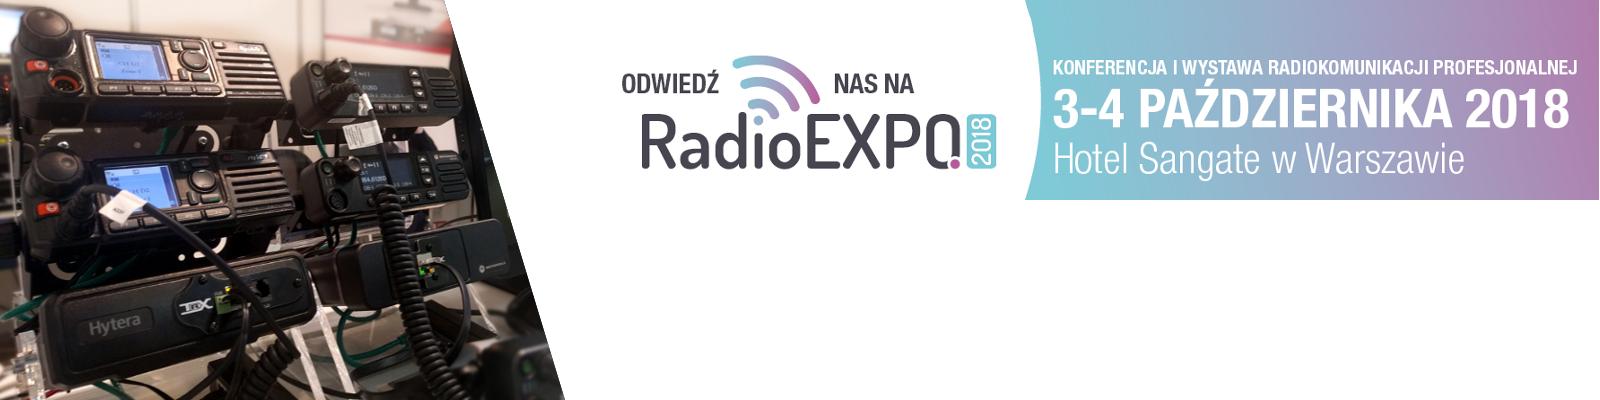 Targi RadioEXPO 2018